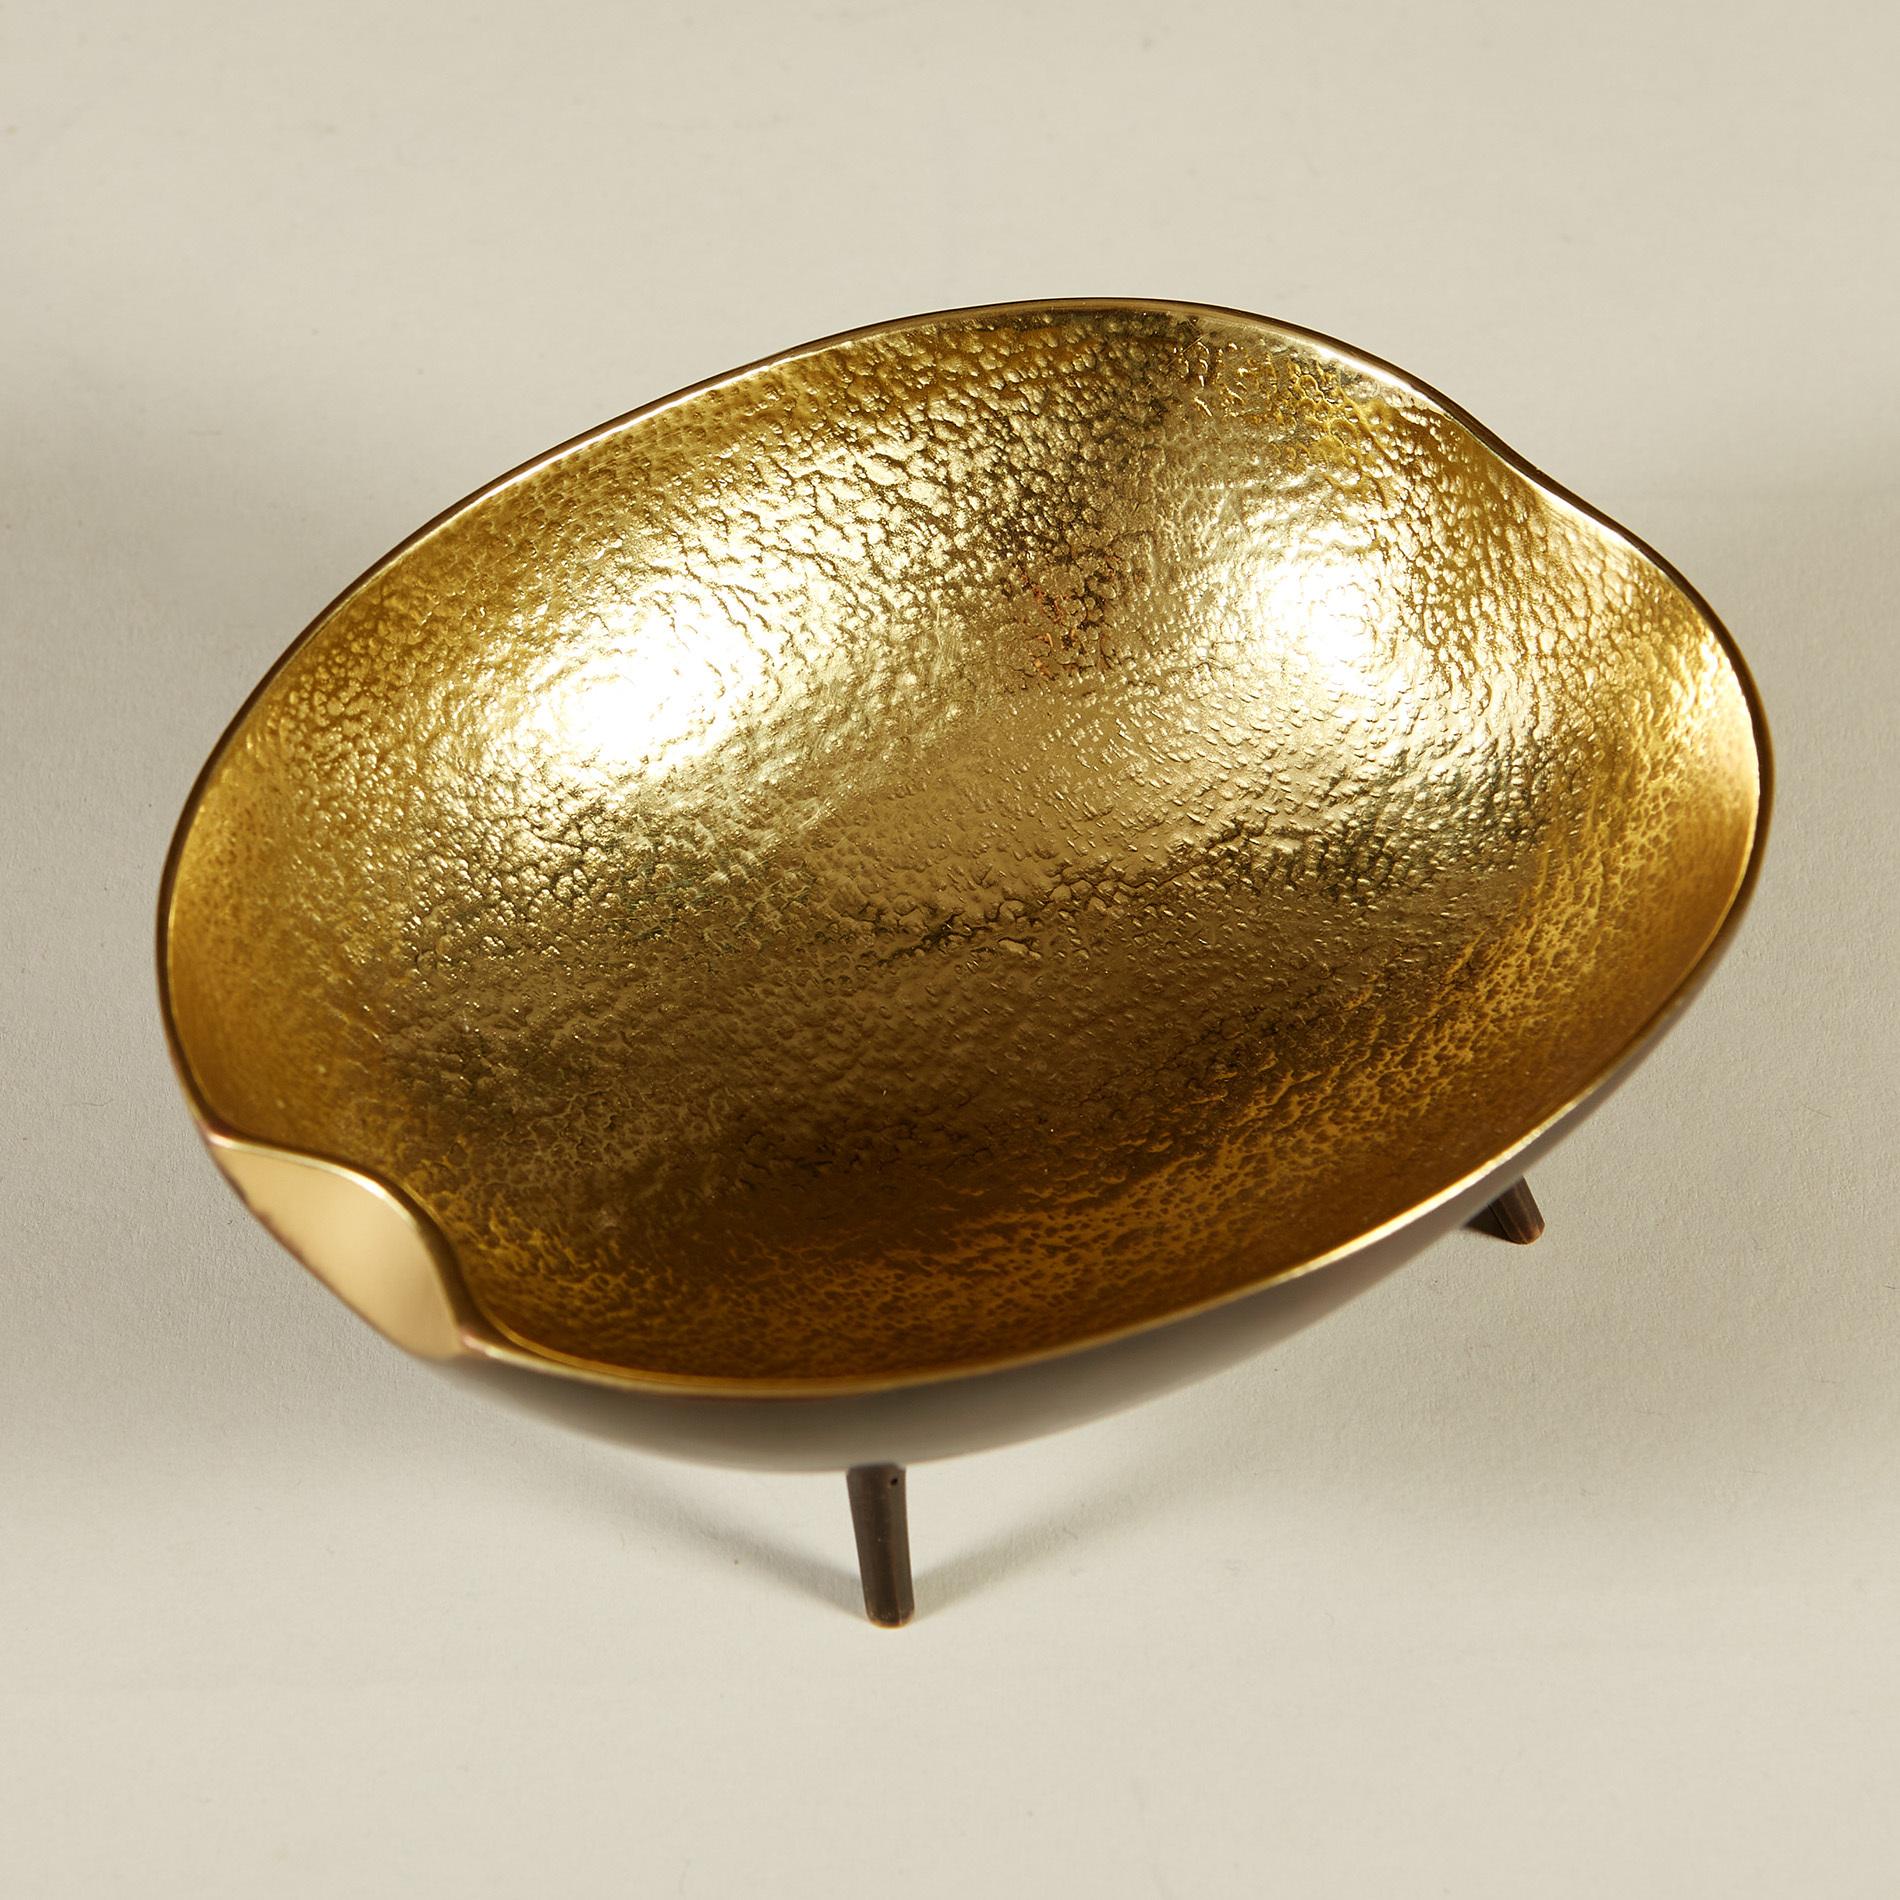 Brass 'Vide Poche' 20210427 Valerie Wade 4 0214 V1